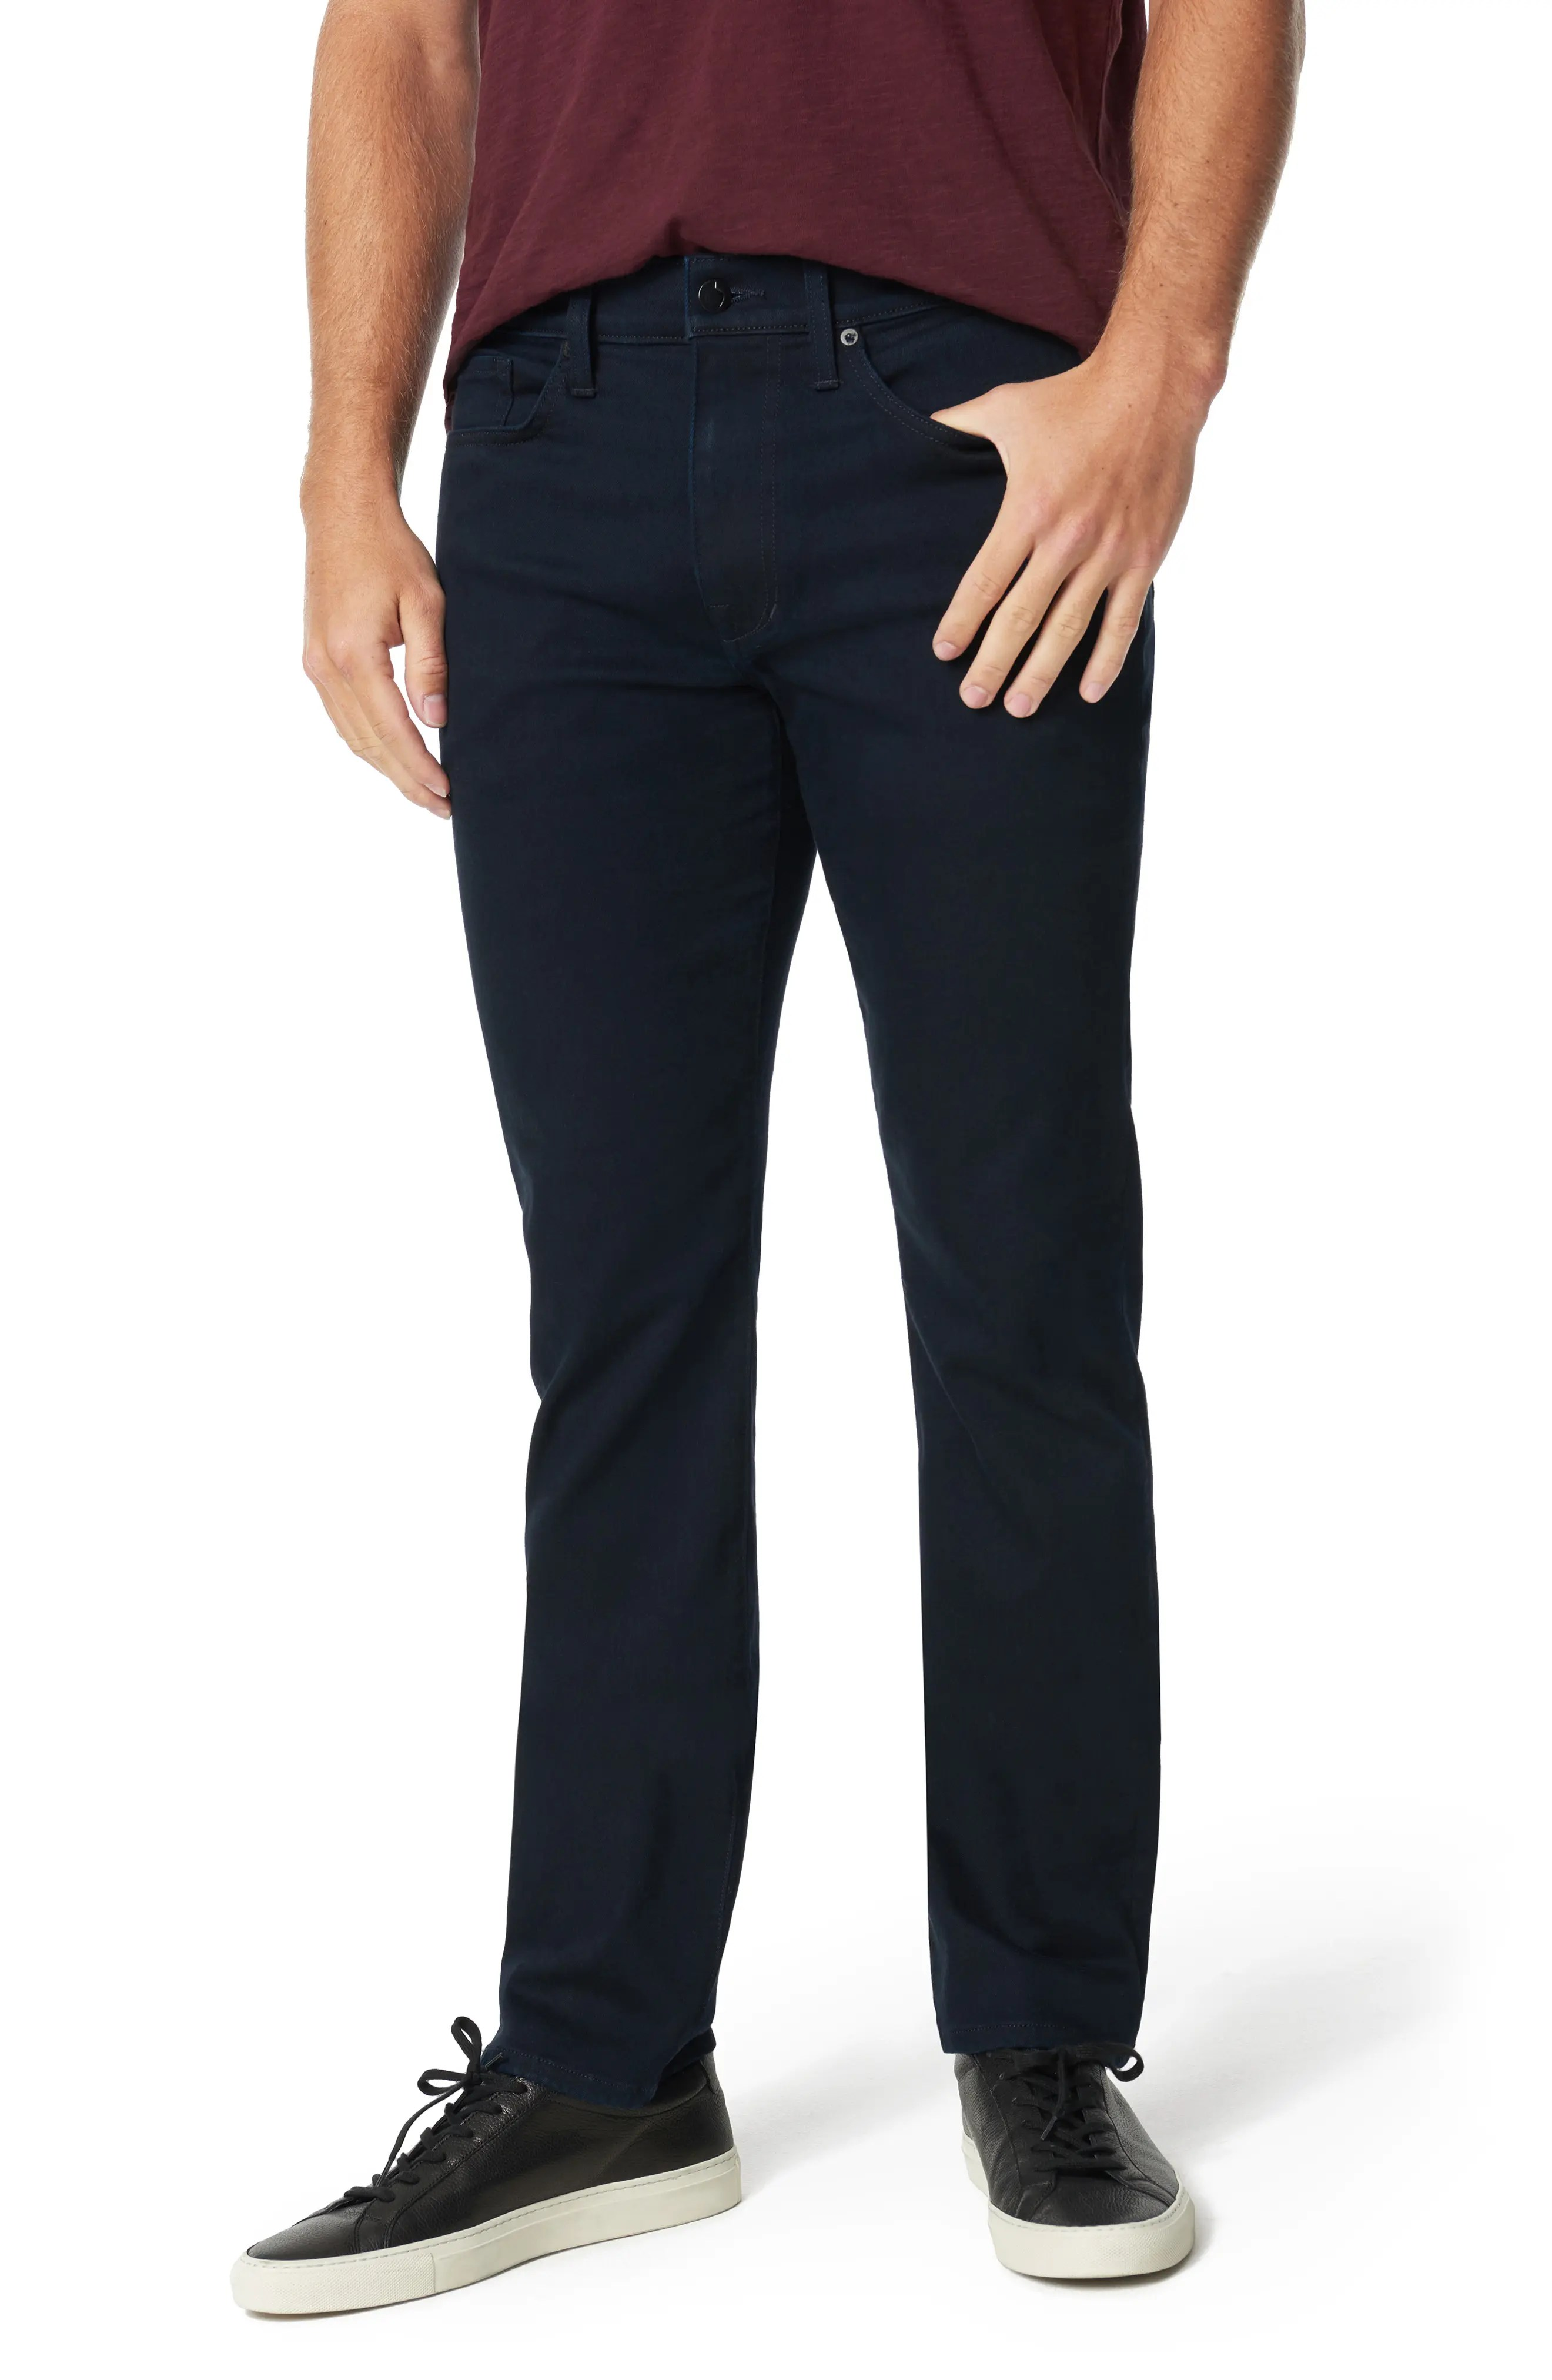 the brixton slim straight leg jeans